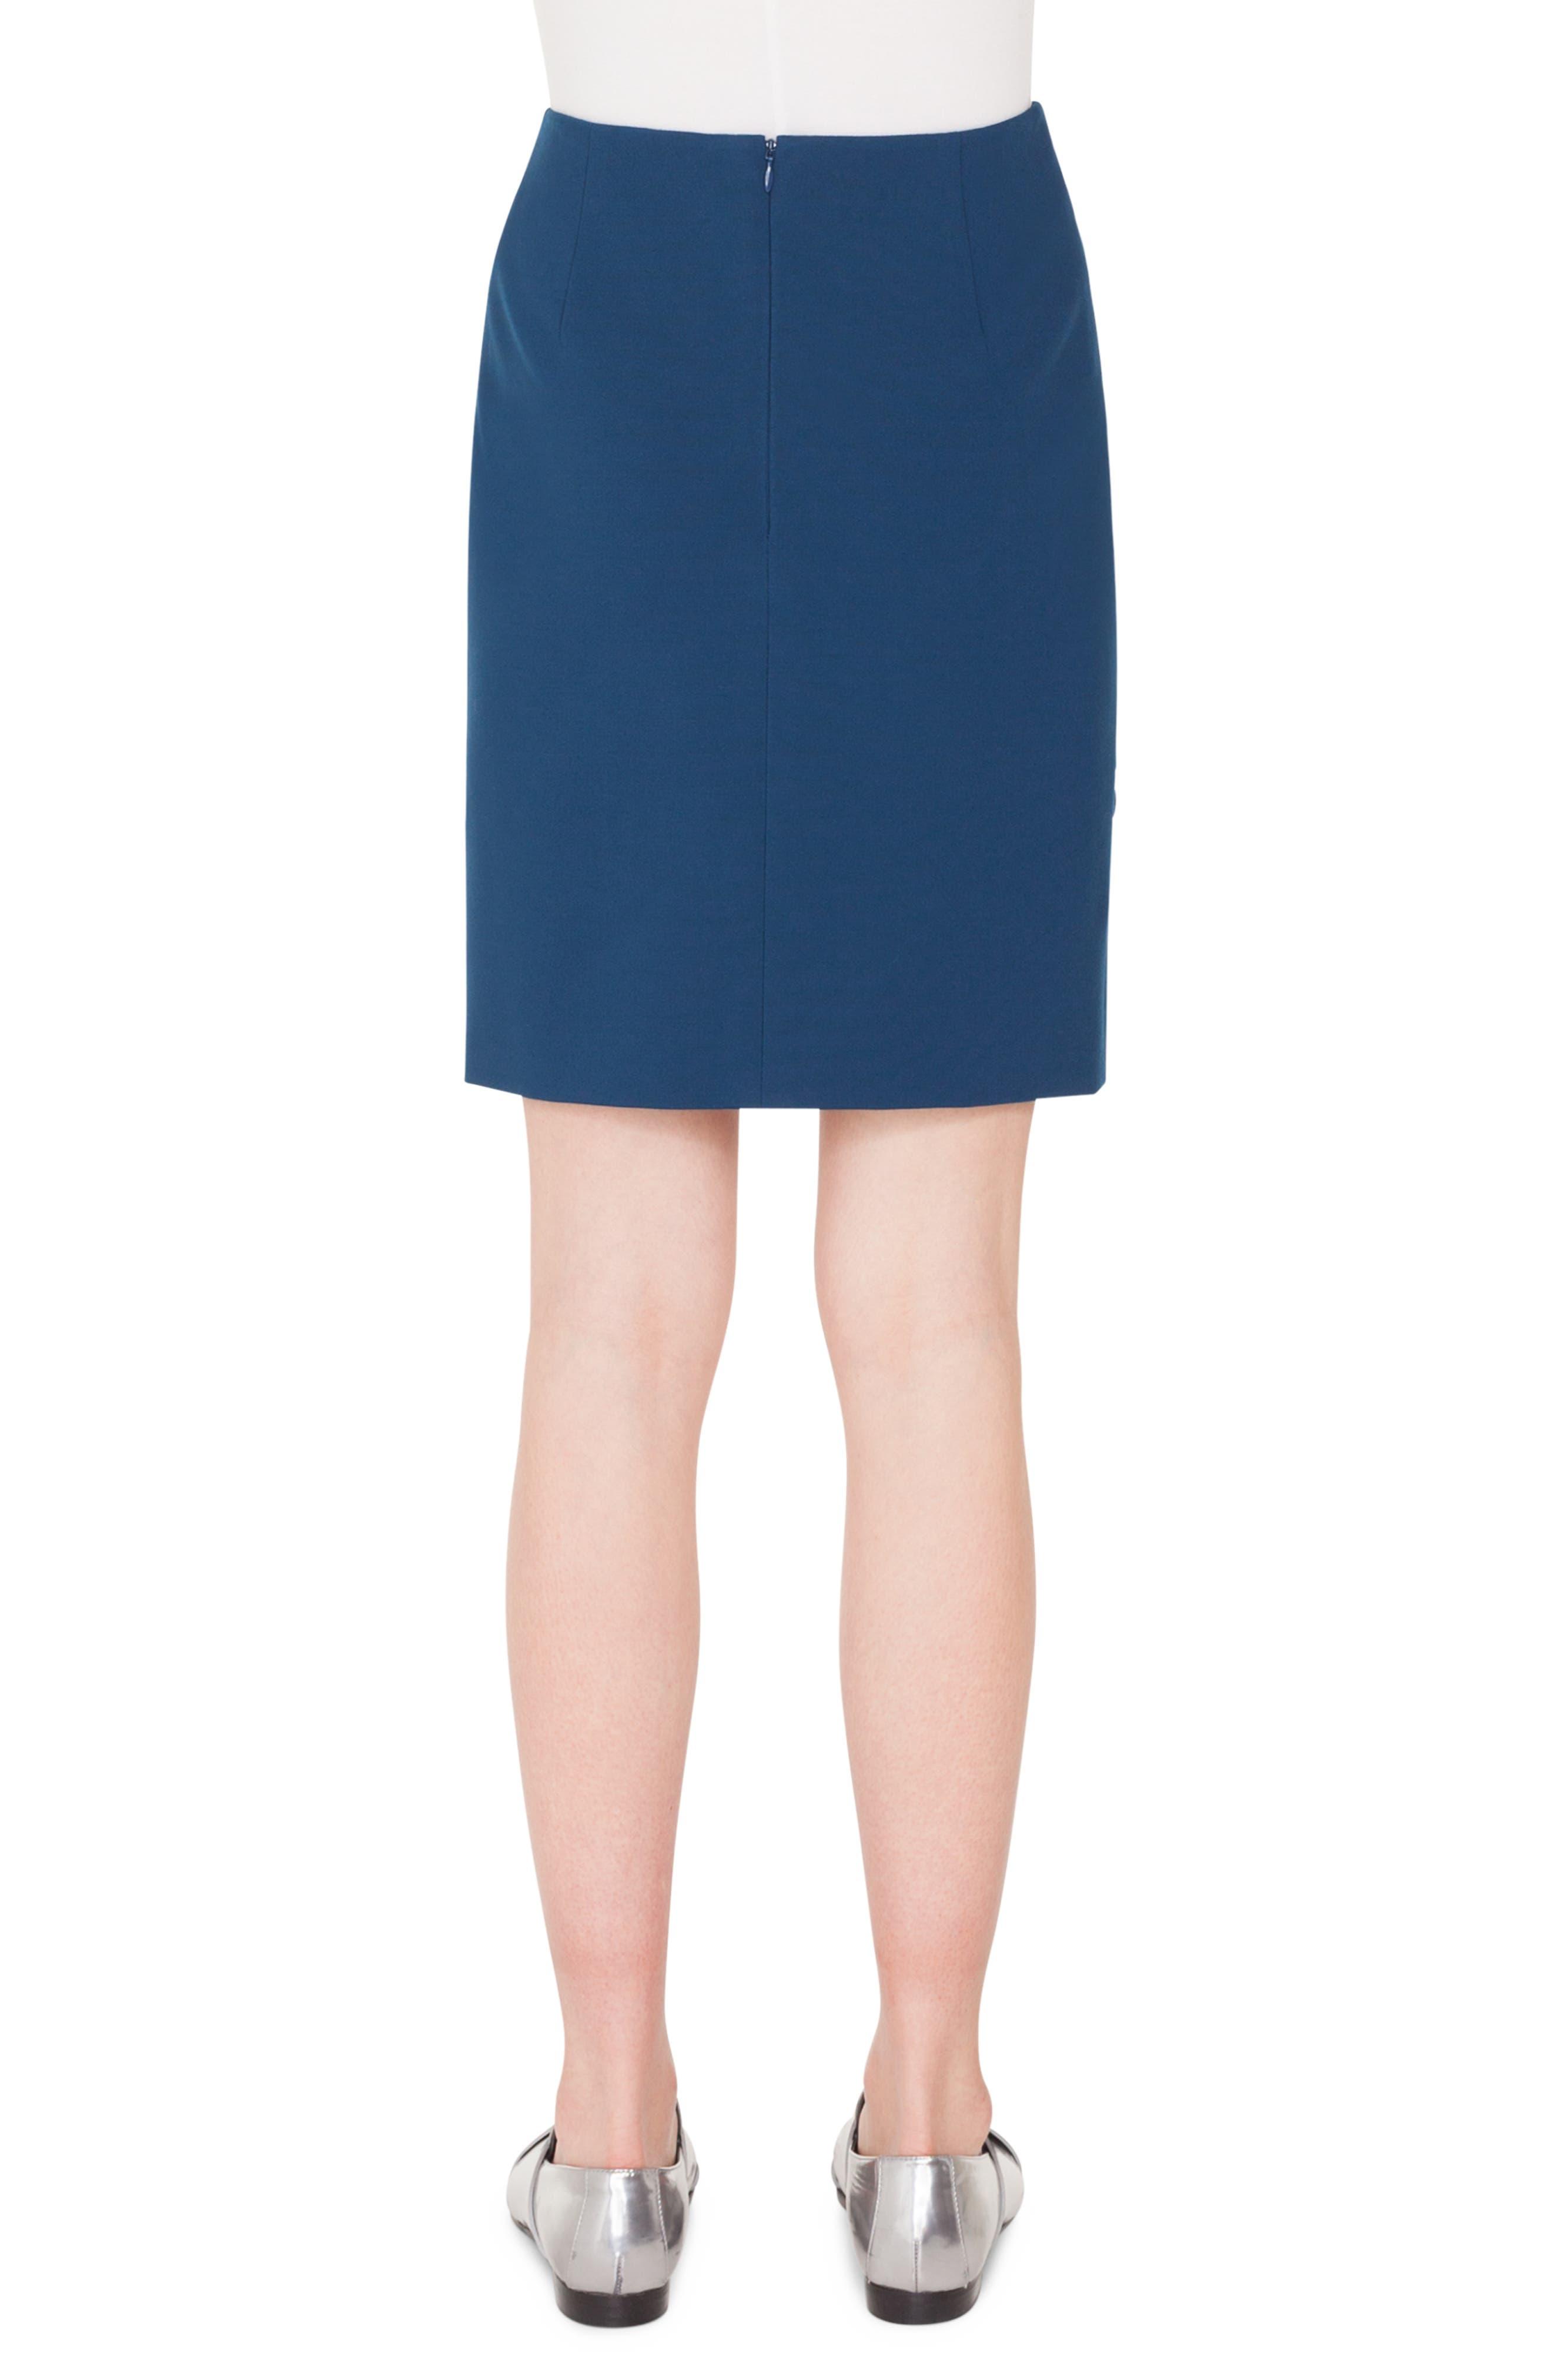 AKRIS PUNTO,                             Scallop Detail Miniskirt,                             Alternate thumbnail 2, color,                             BLU MARE